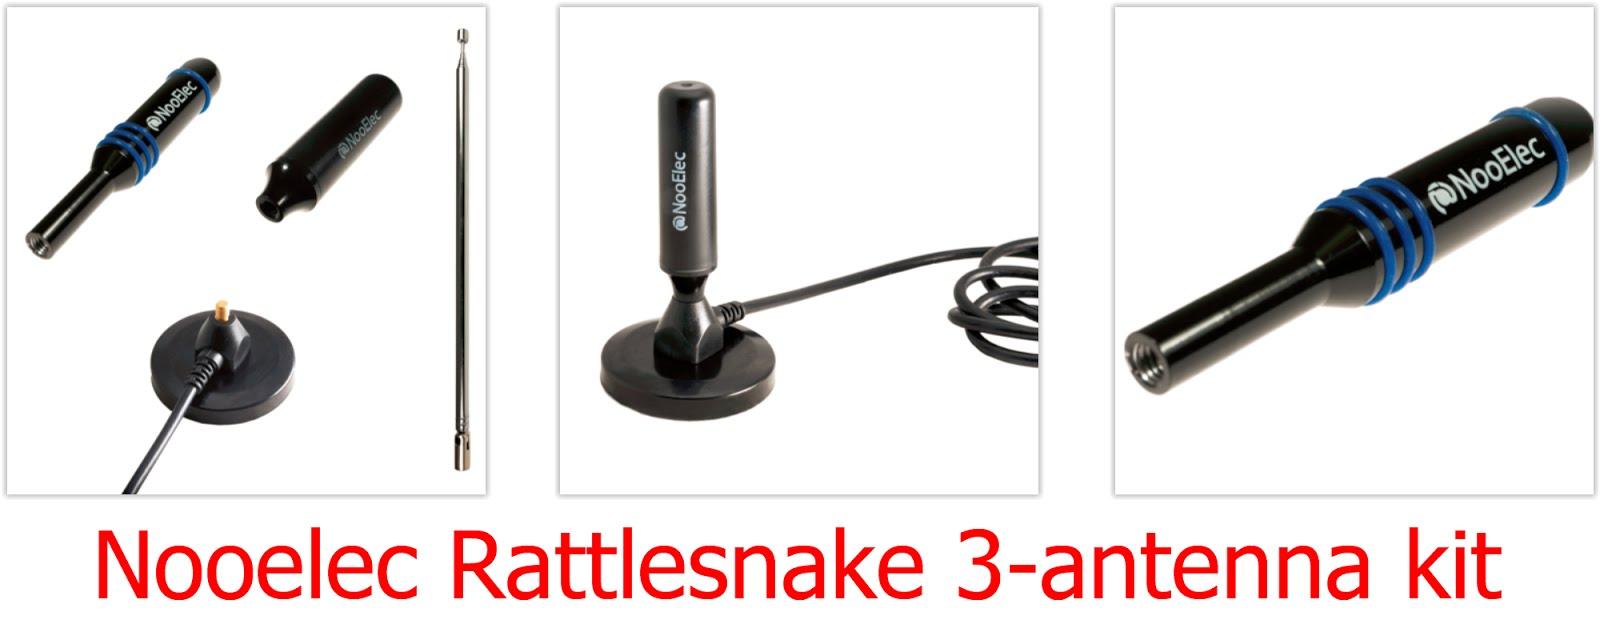 Radio for Everyone: Review: Nooelec Rattlesnake 3-antenna kit